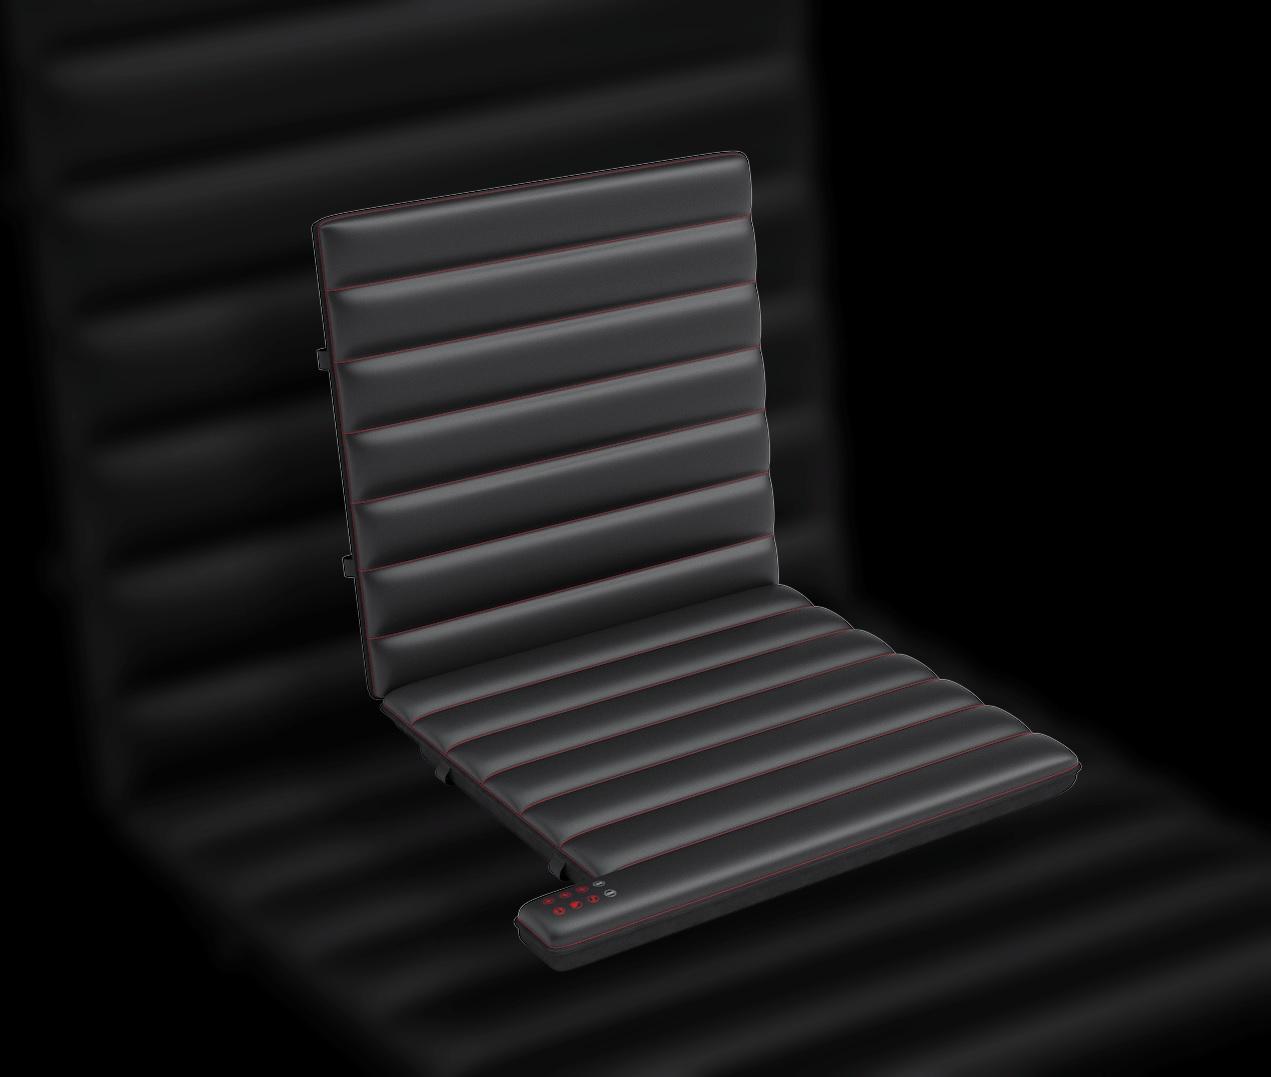 SenseForce Pad Extreme Review Test Kritik Gaming 4D Heimkino SensePad Matte Vibration Zocken SenseForce PX